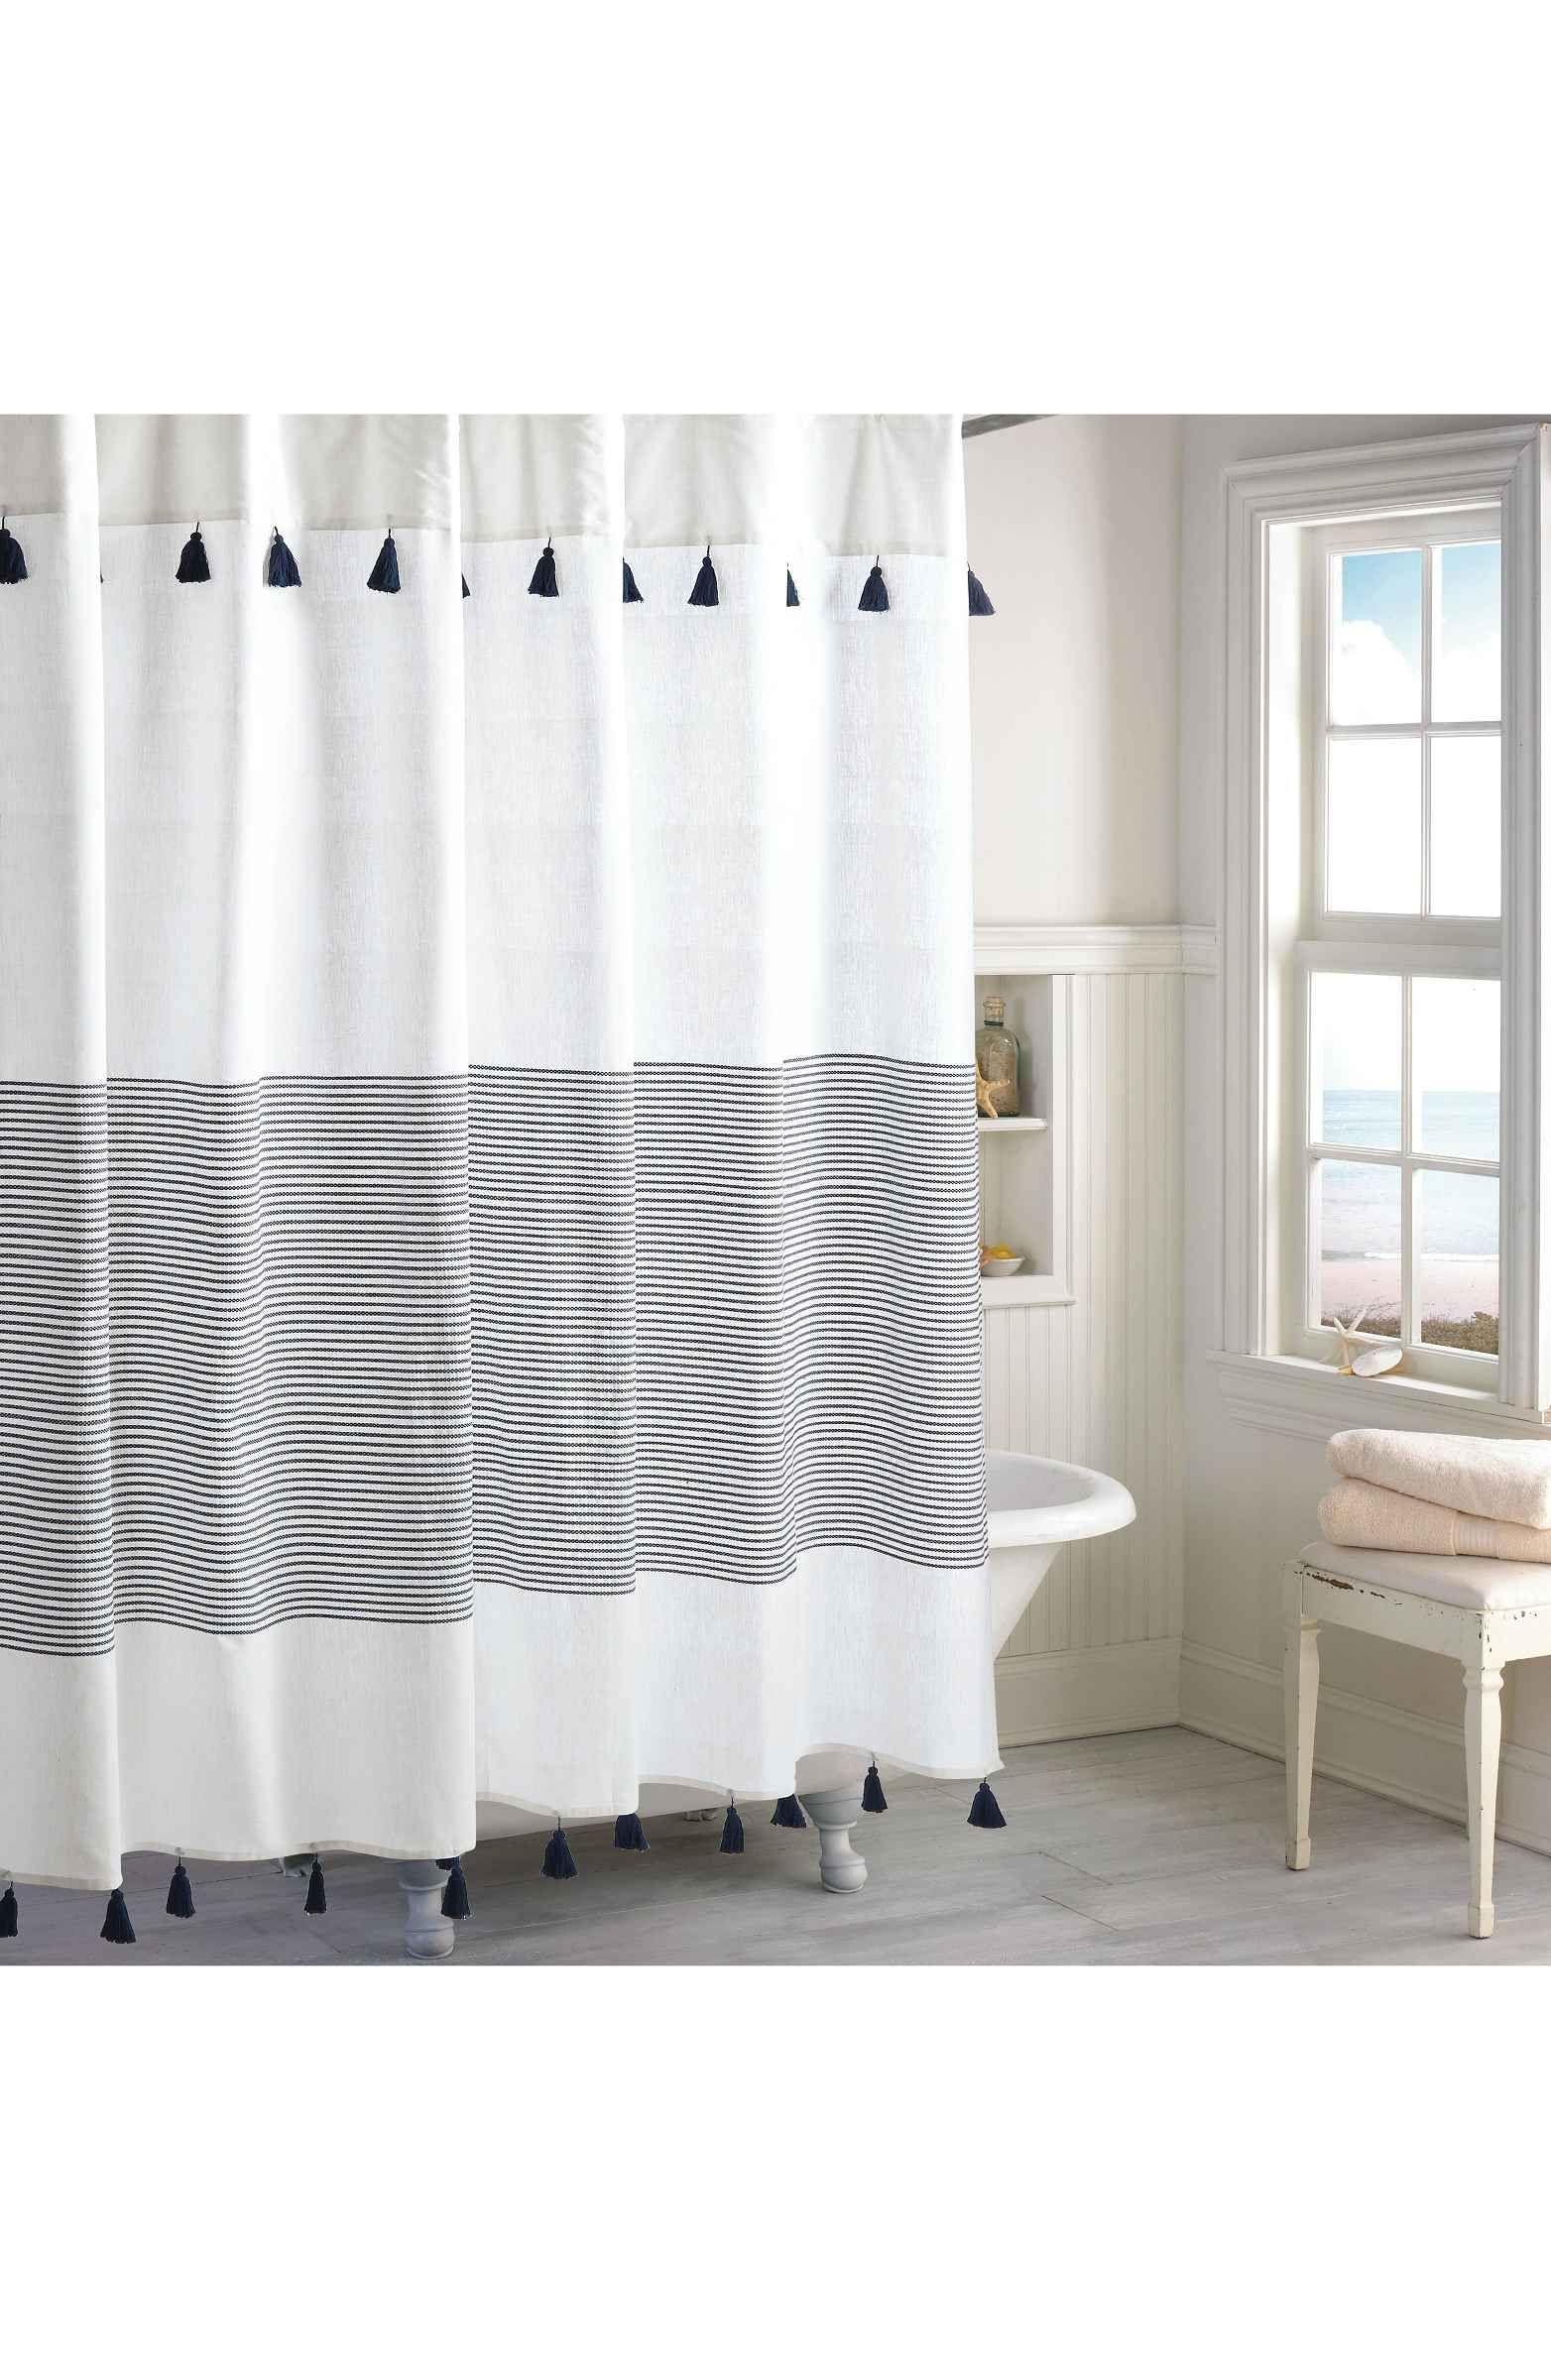 Main Image - Peri Home Panama Stripe Shower Curtain | Home & Decor ...